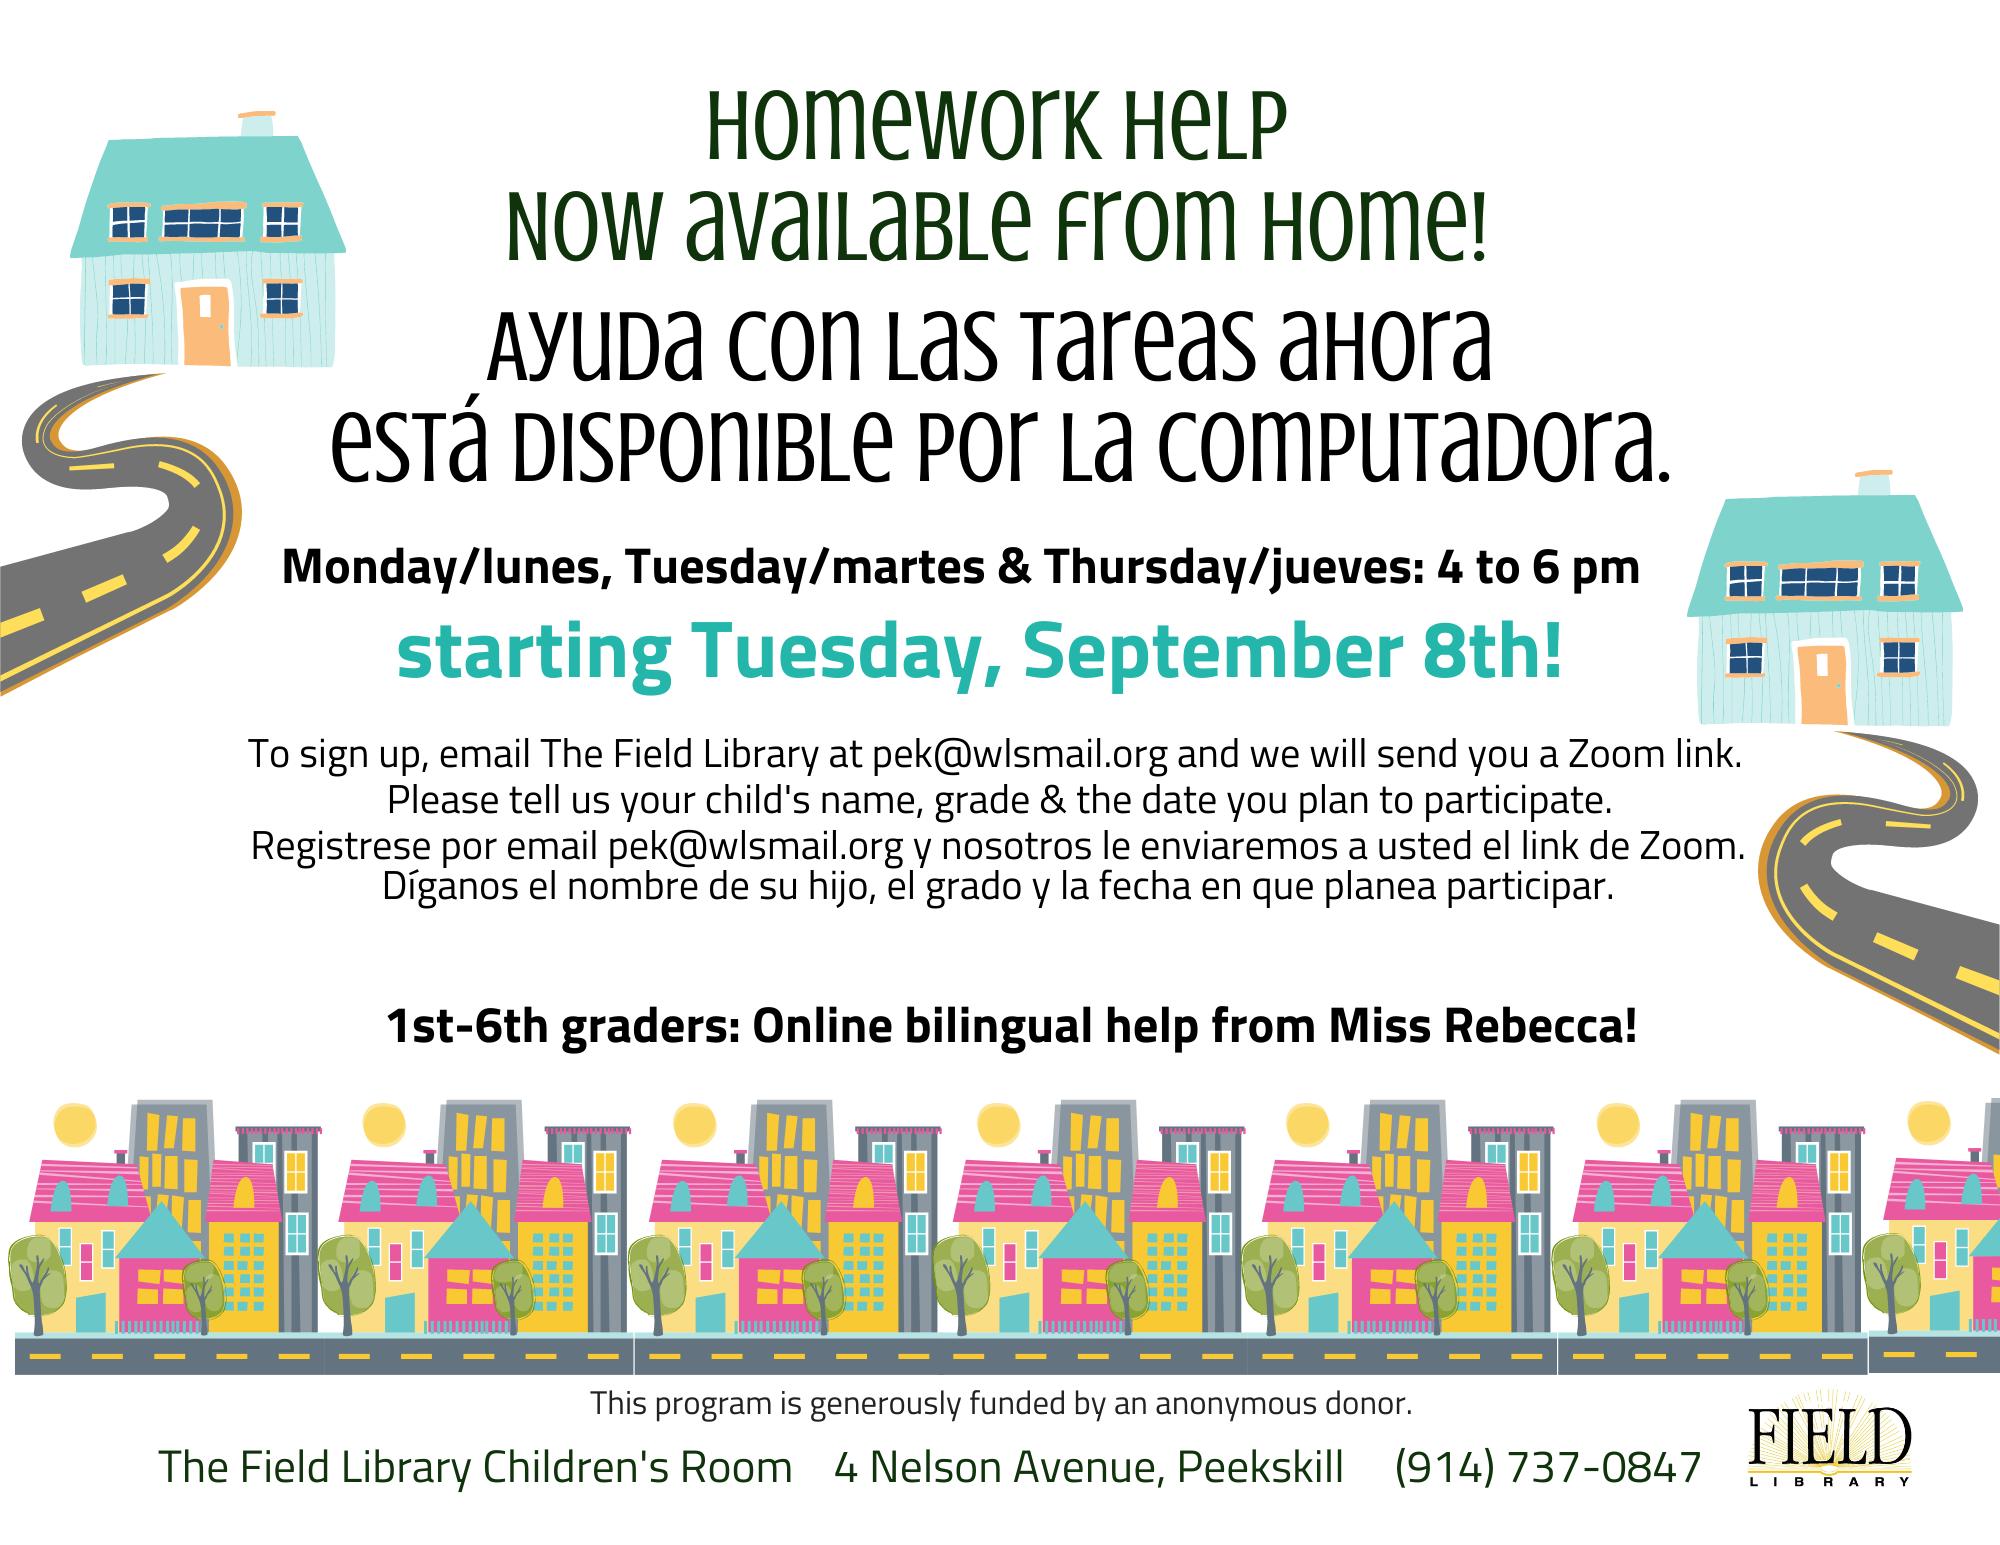 Homework Help from Home 2020 School Year